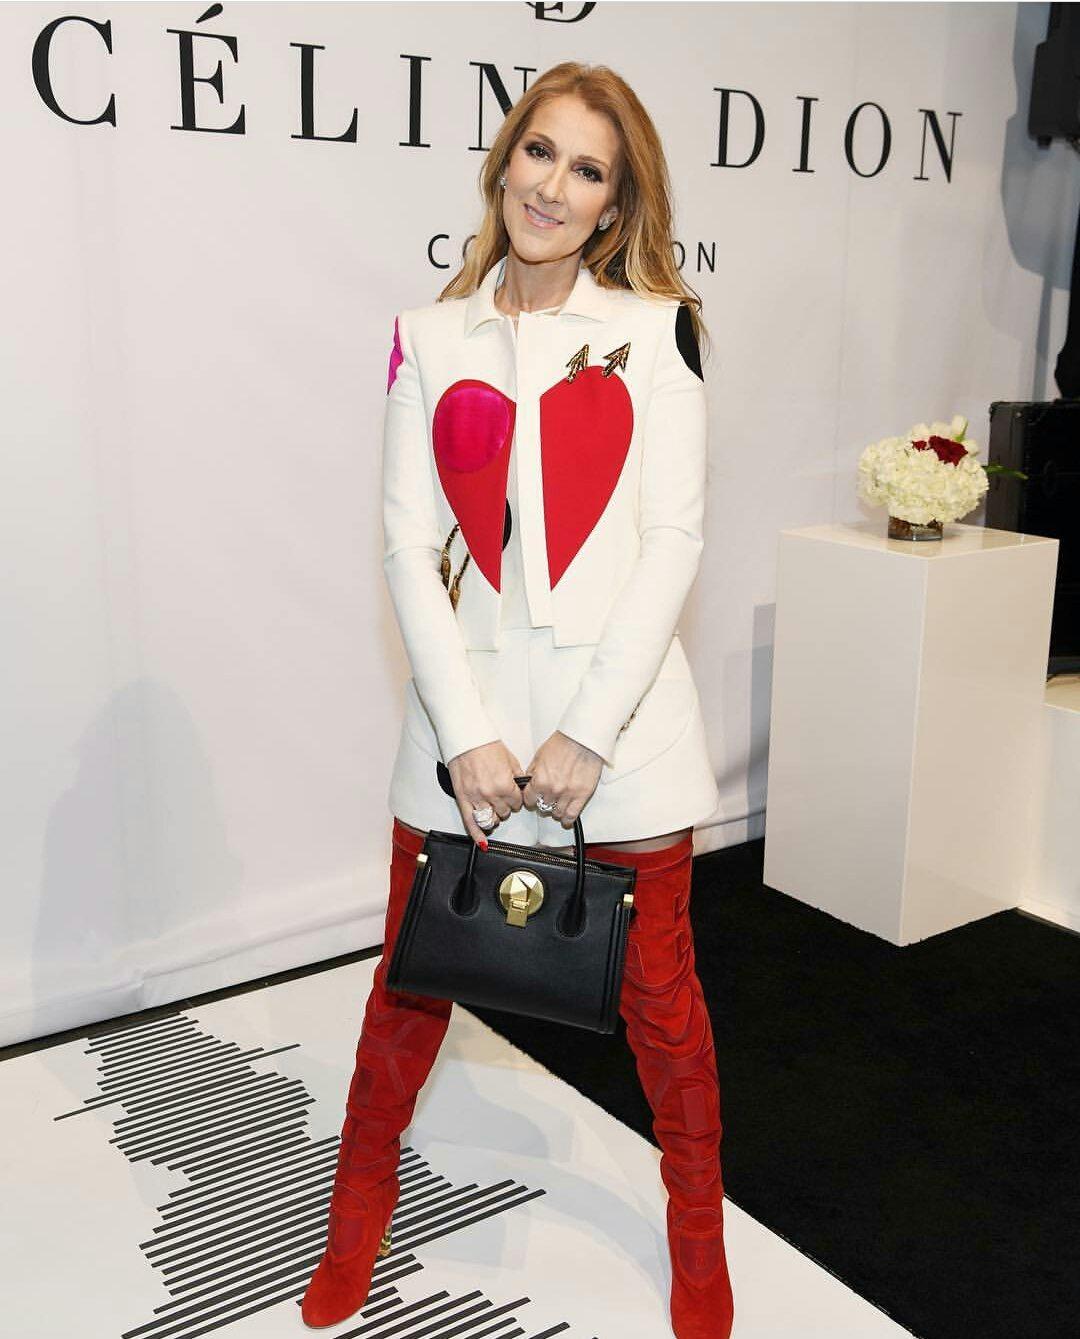 Celine Dion Style